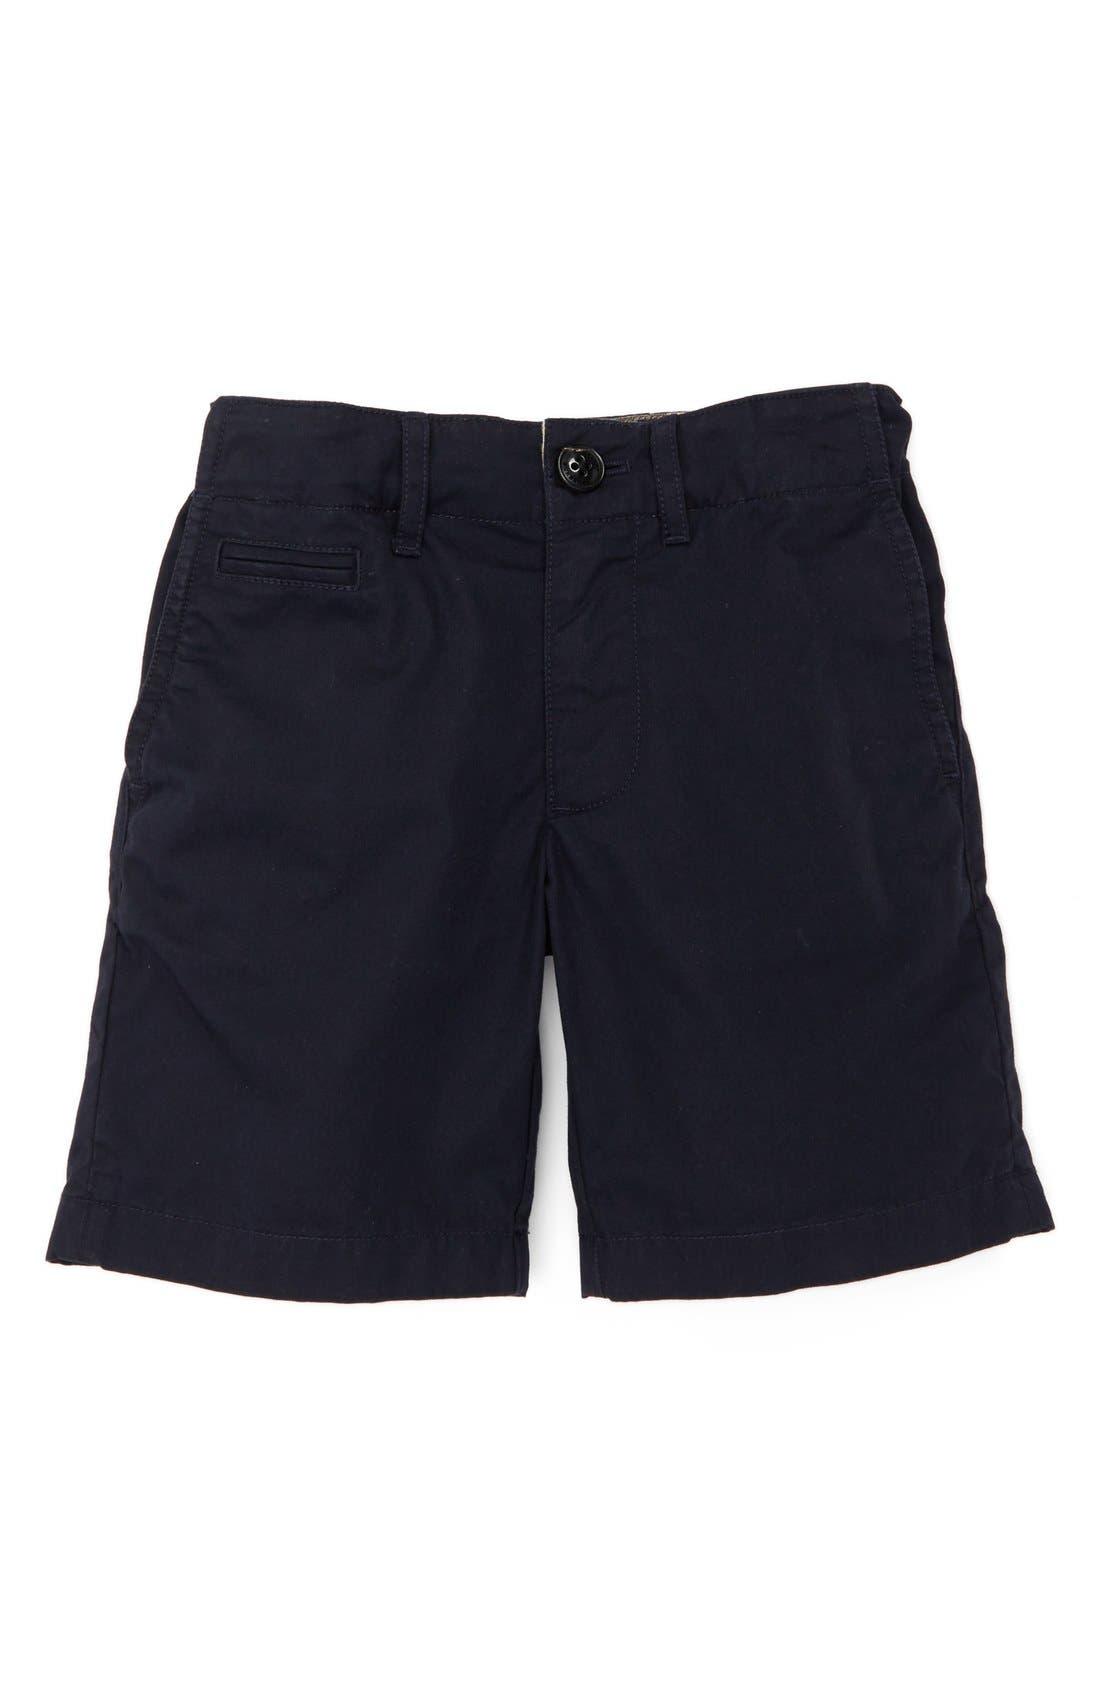 'Tristen' Shorts,                         Main,                         color, Ink